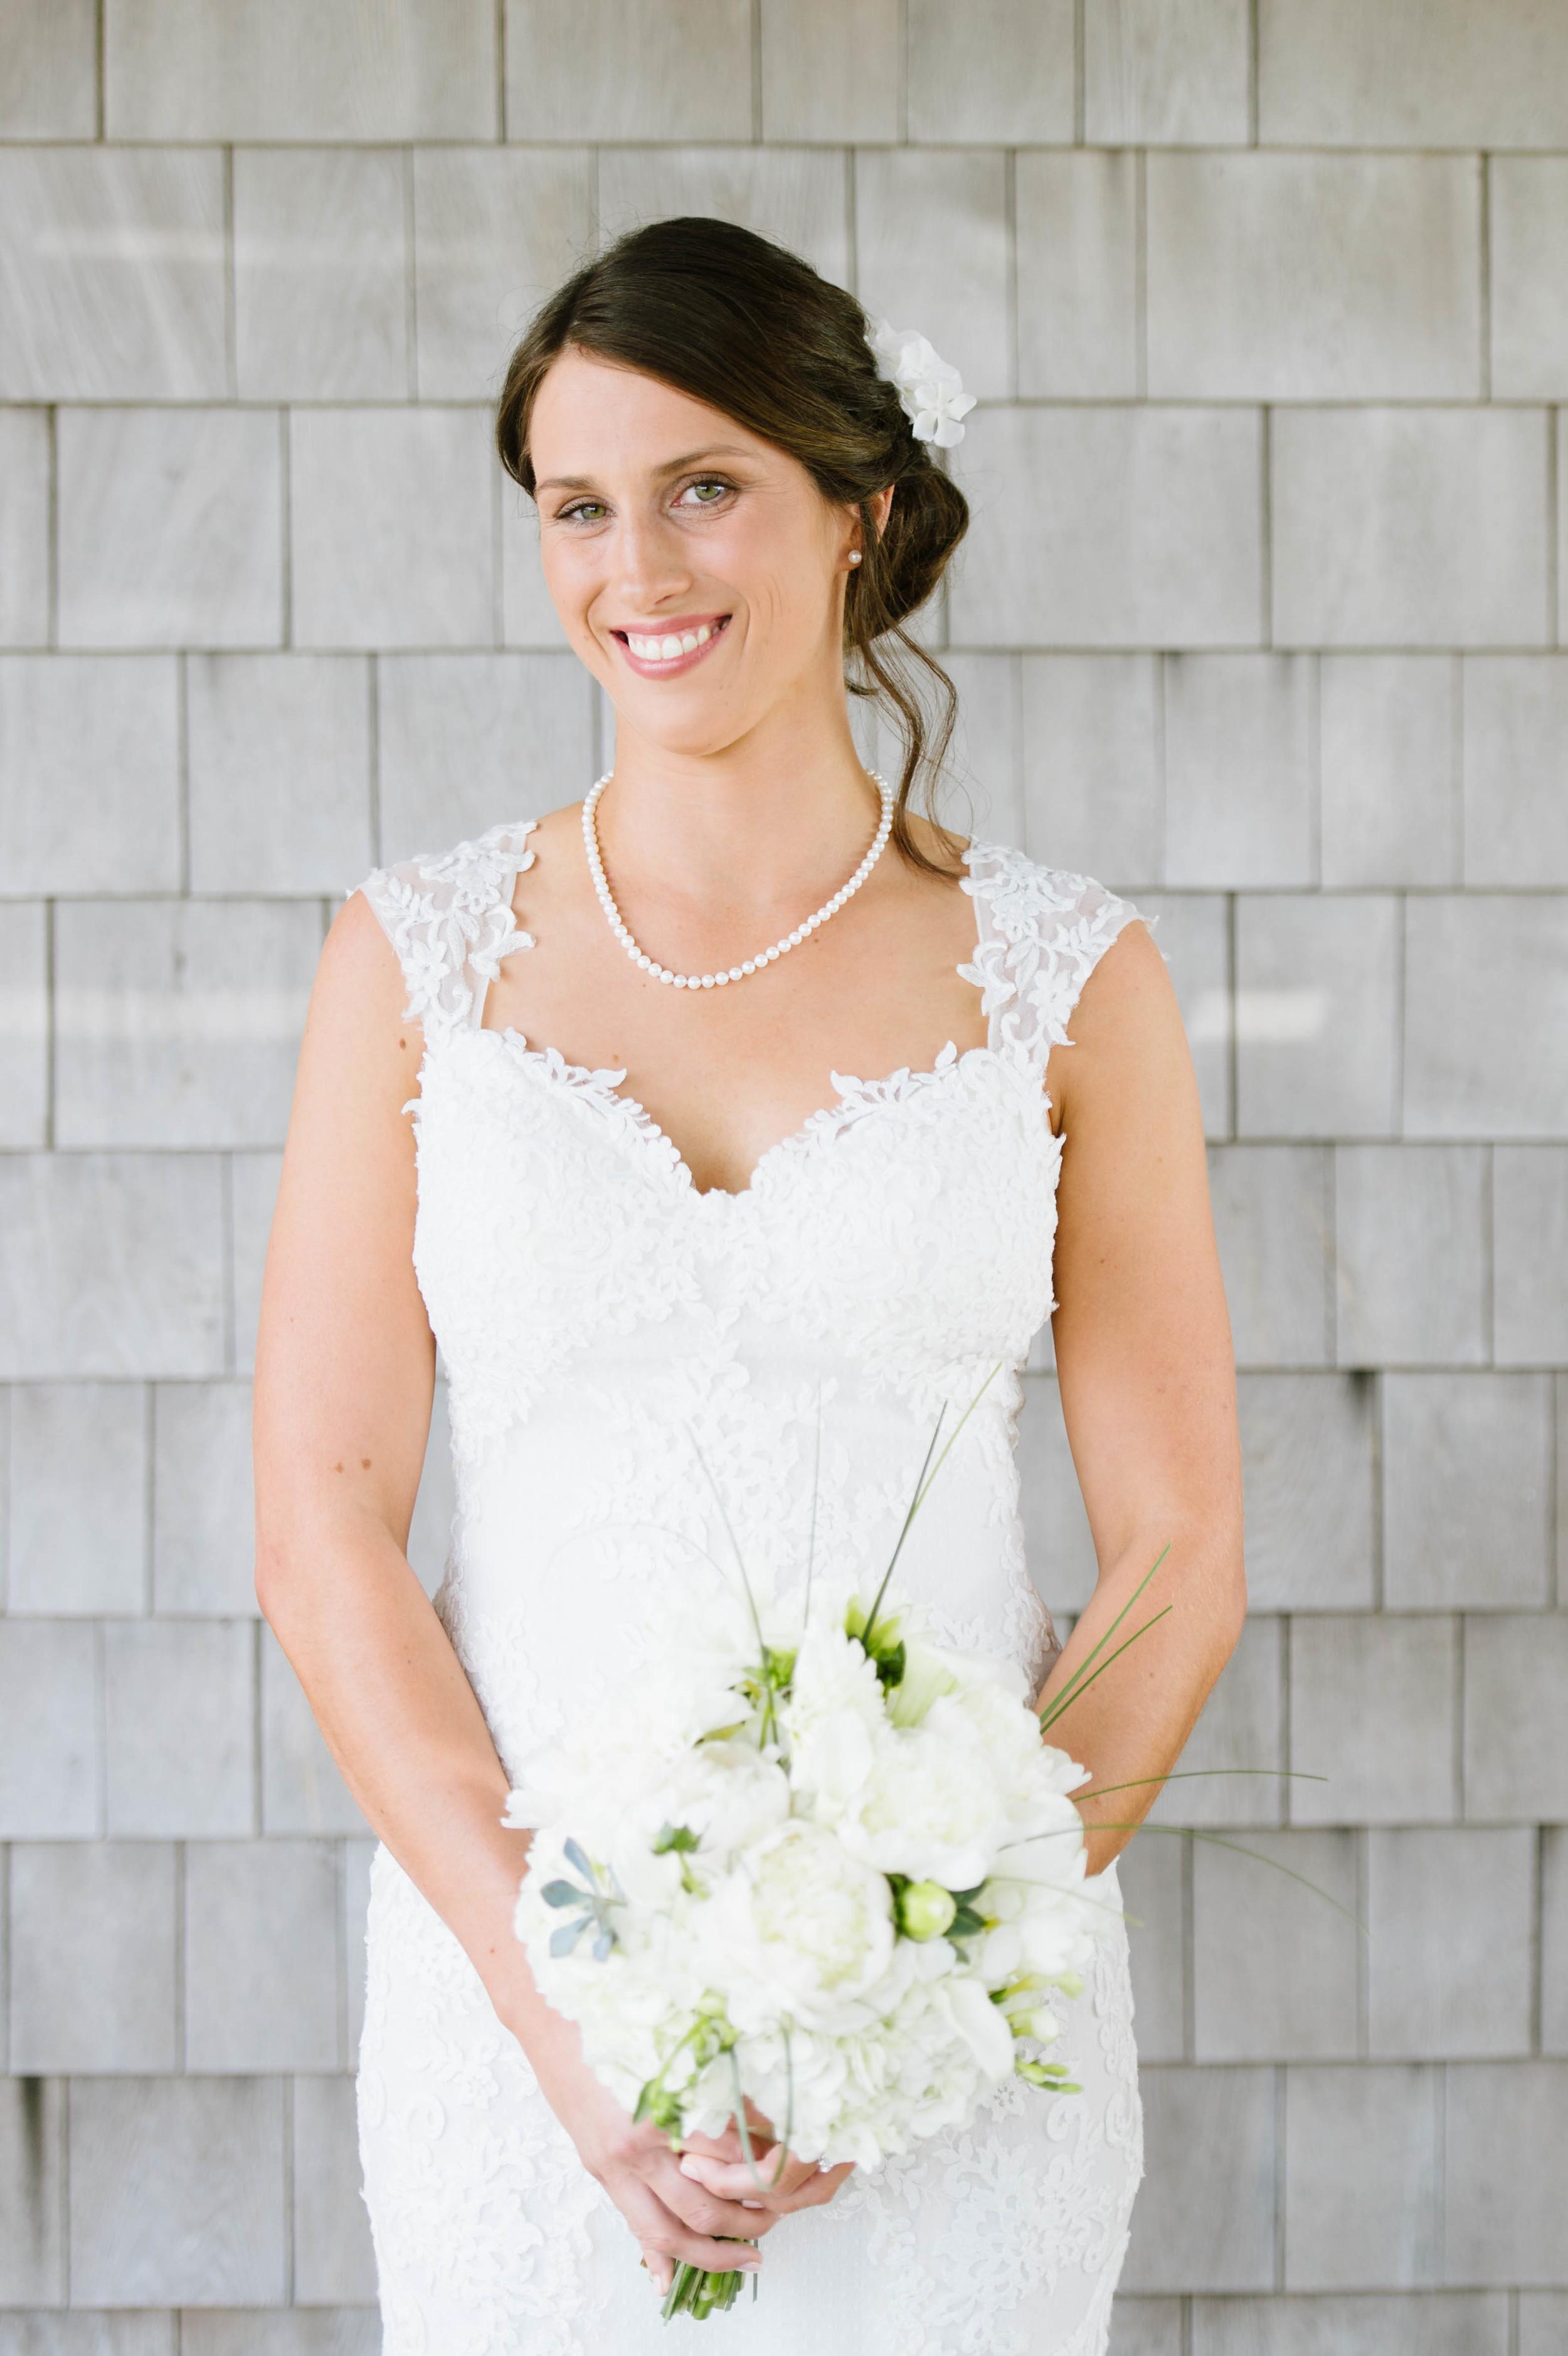 Pelham_House_Wedding_Cape_Cod020.jpg